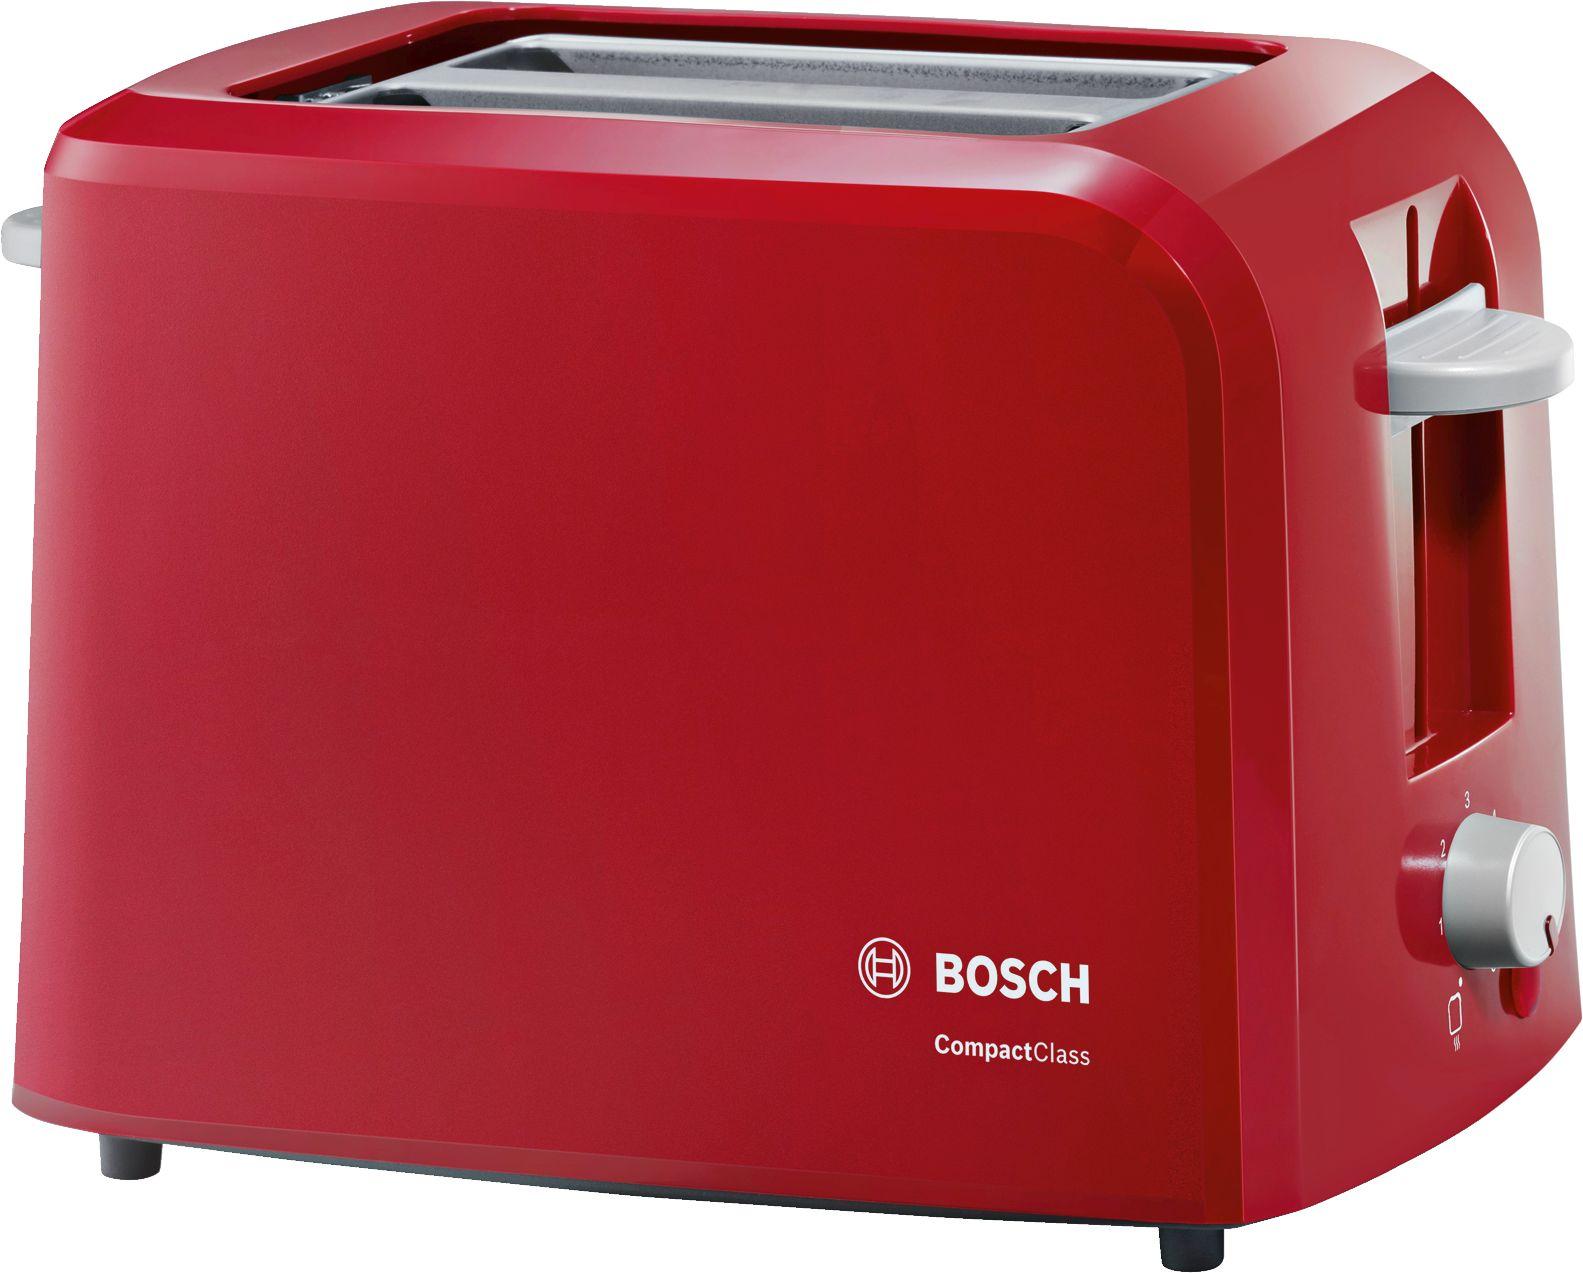 Toster electronic CompactClass crvena / svetlo siva